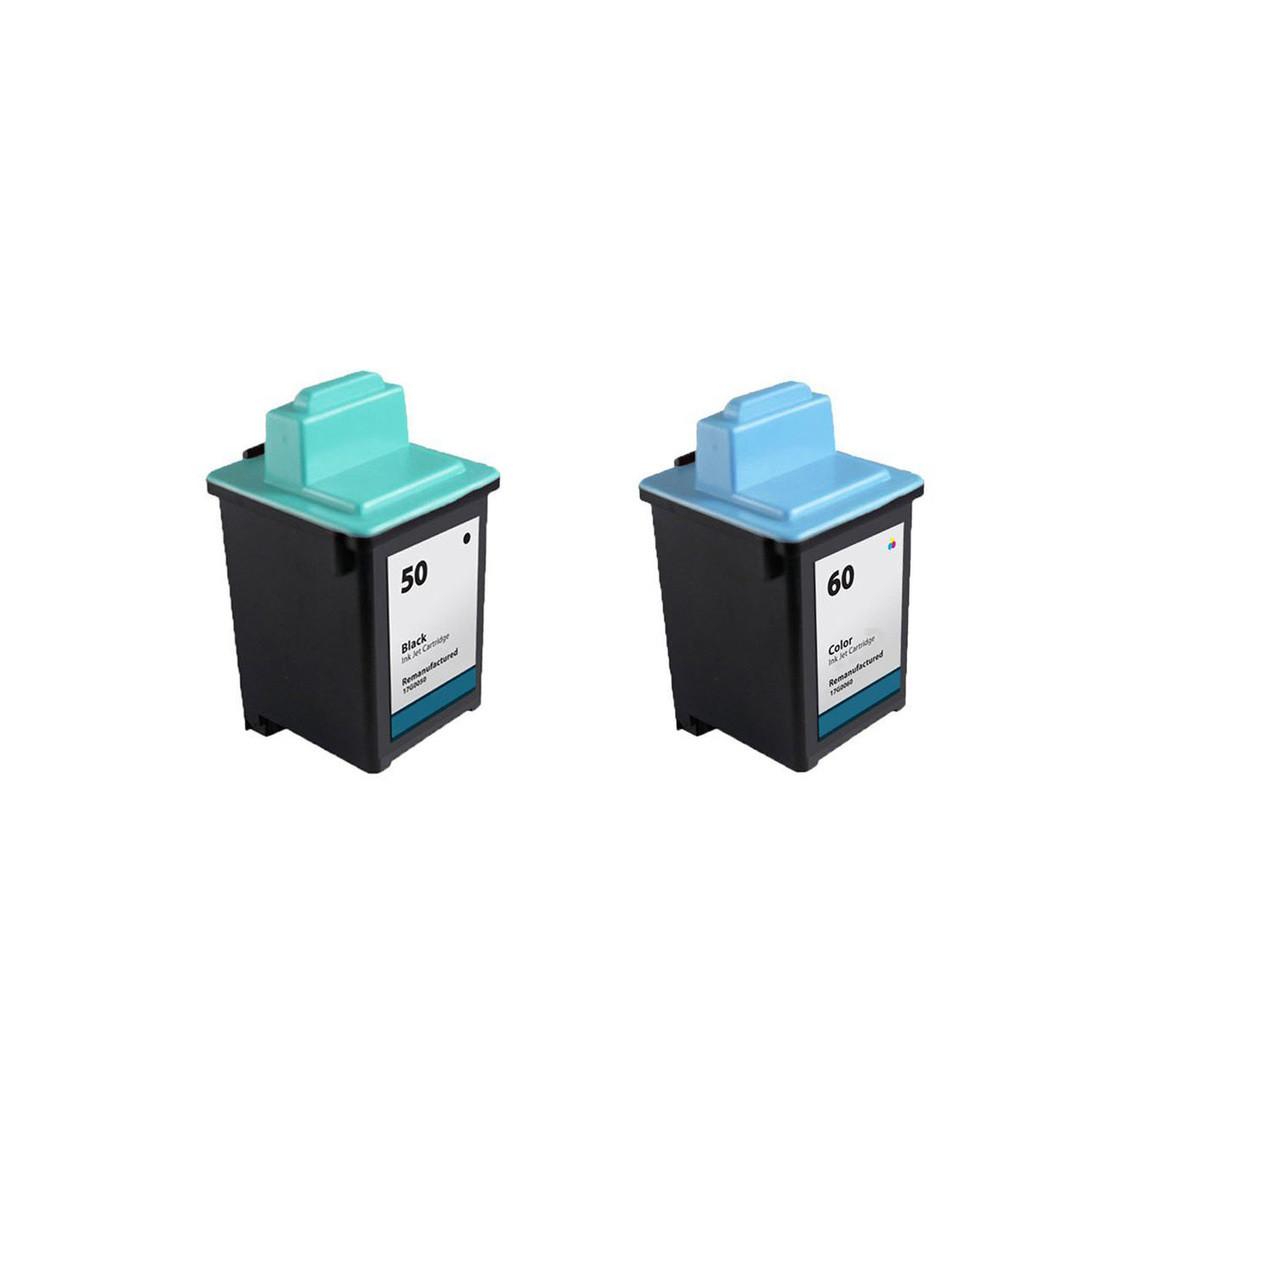 Z32; Black Ink Myriad Compatible Inkjet Cartridges Bulk: R17G0050 Z22 50; Models: Z12 Replacement for Lexmark 17G0050 5 Inkjet Cartridges